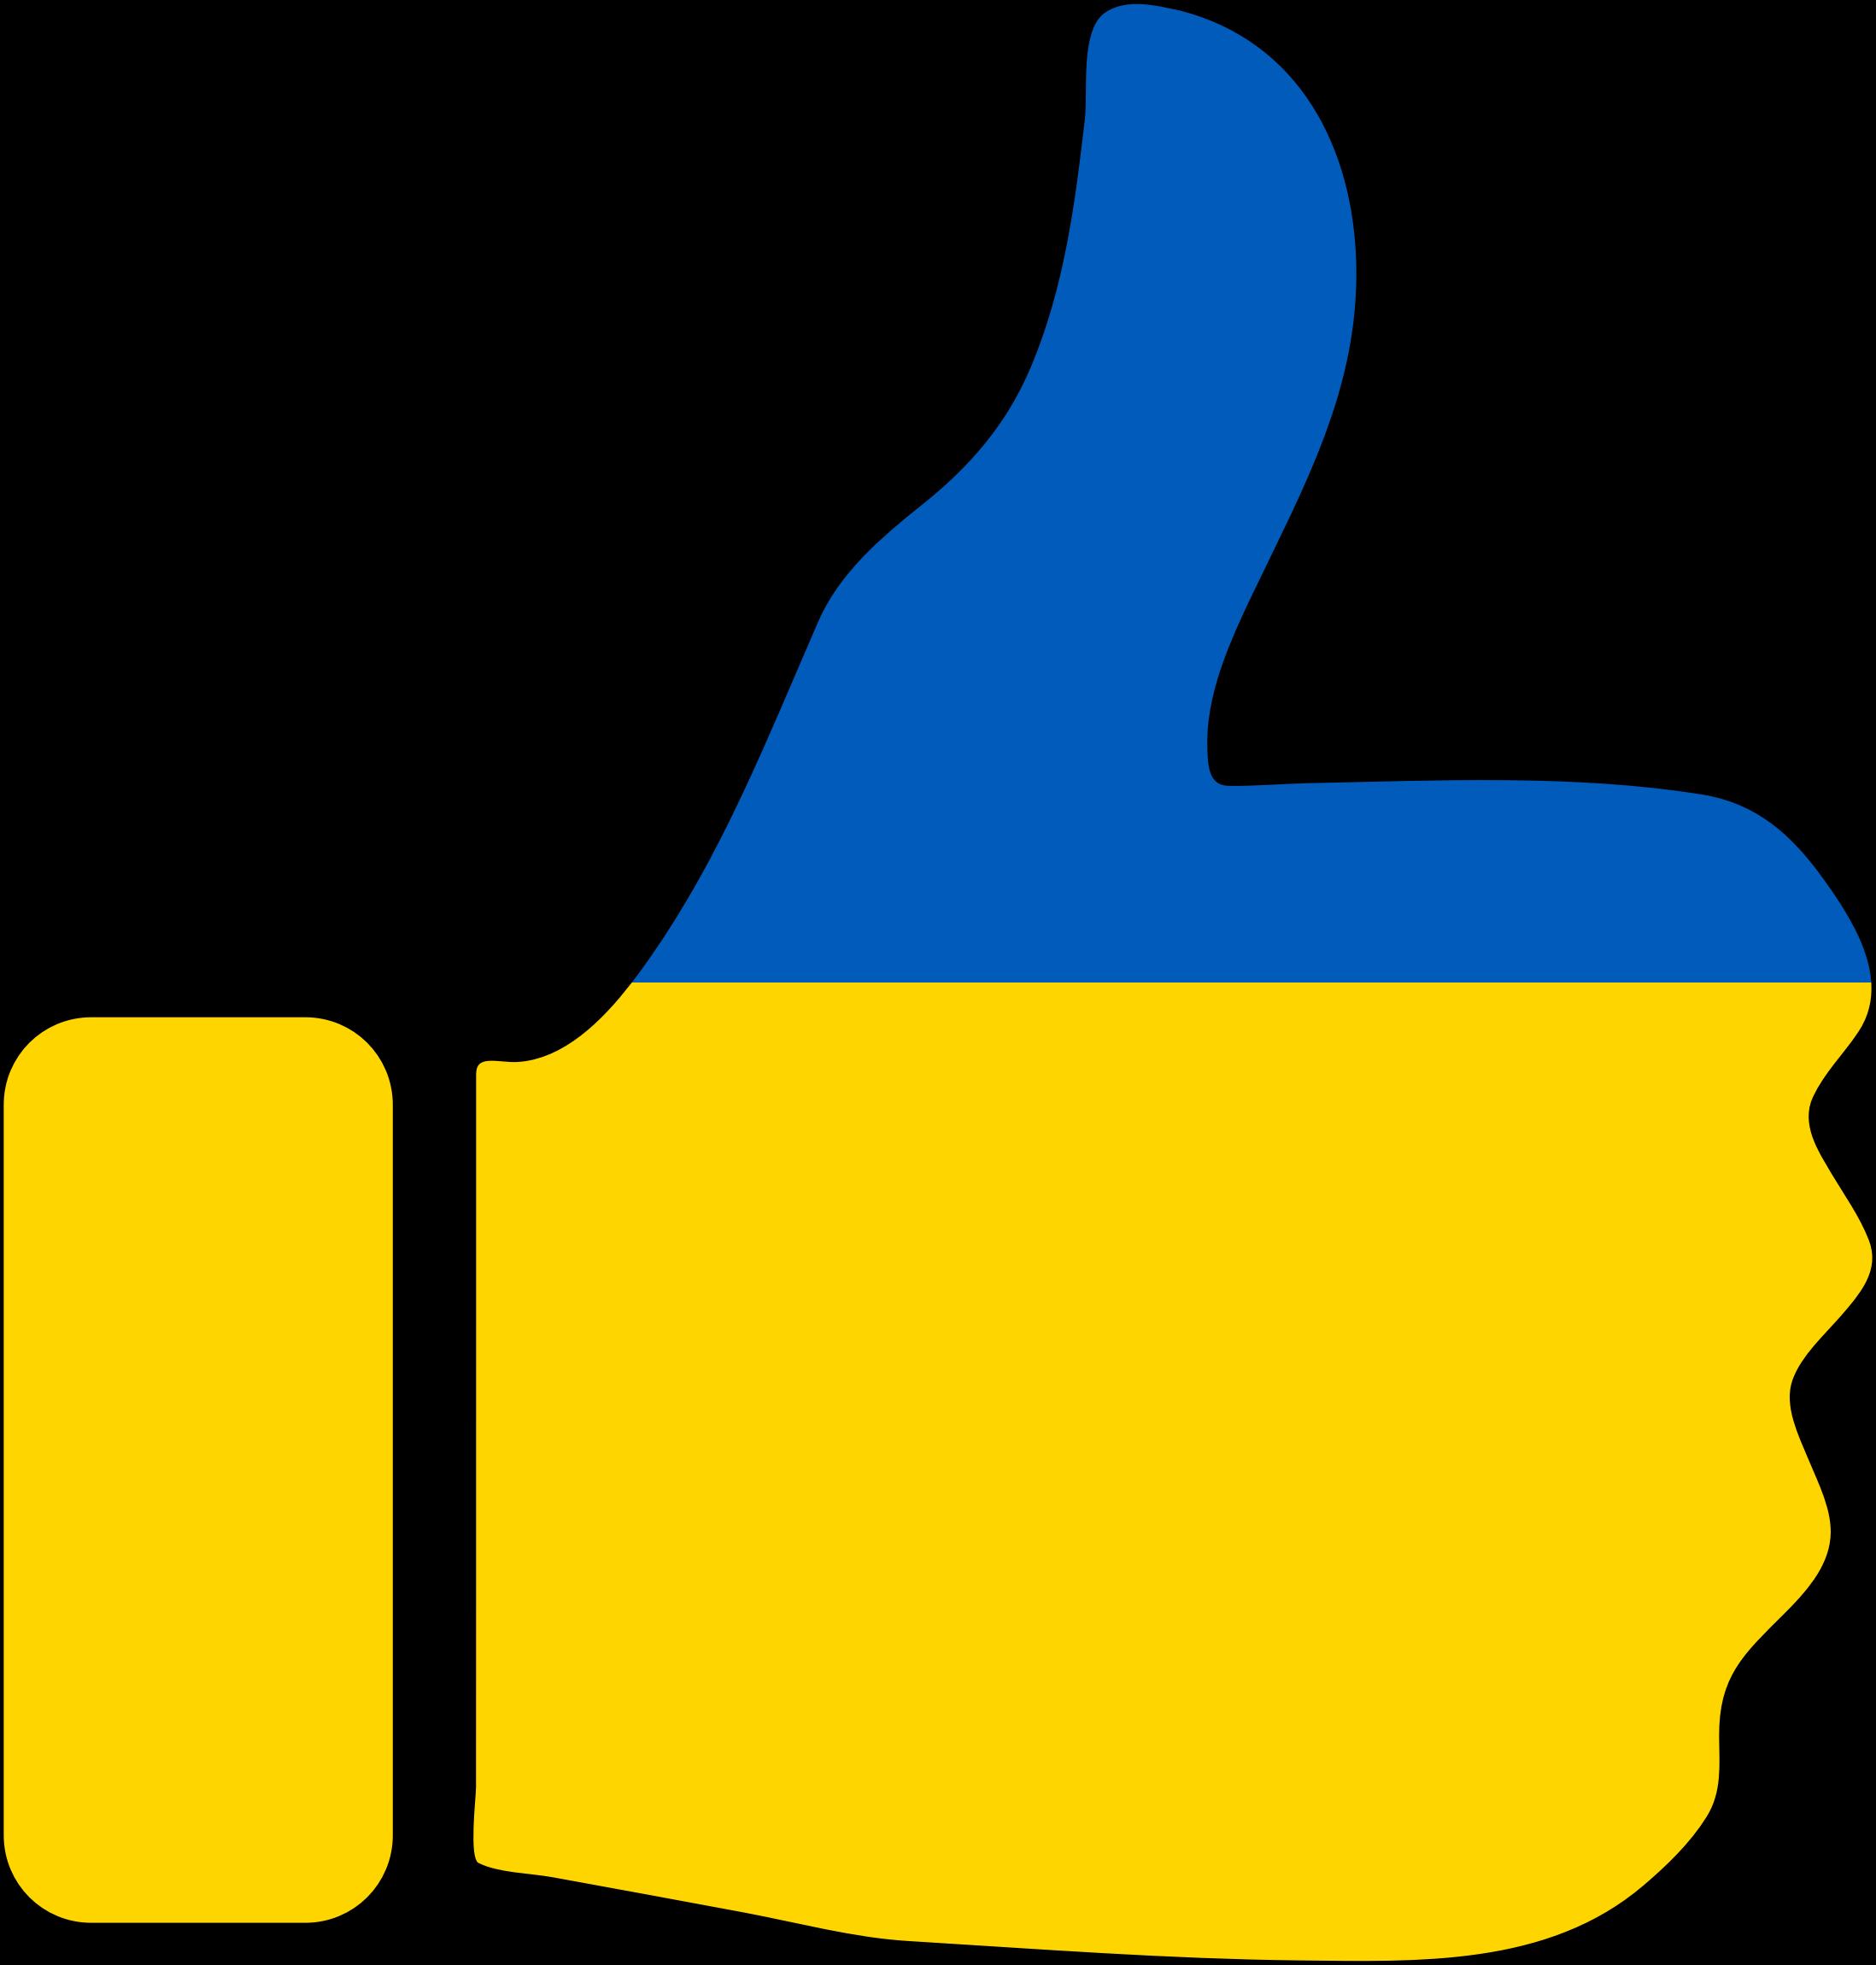 BIG IMAGE (PNG) - Ukraine PNG